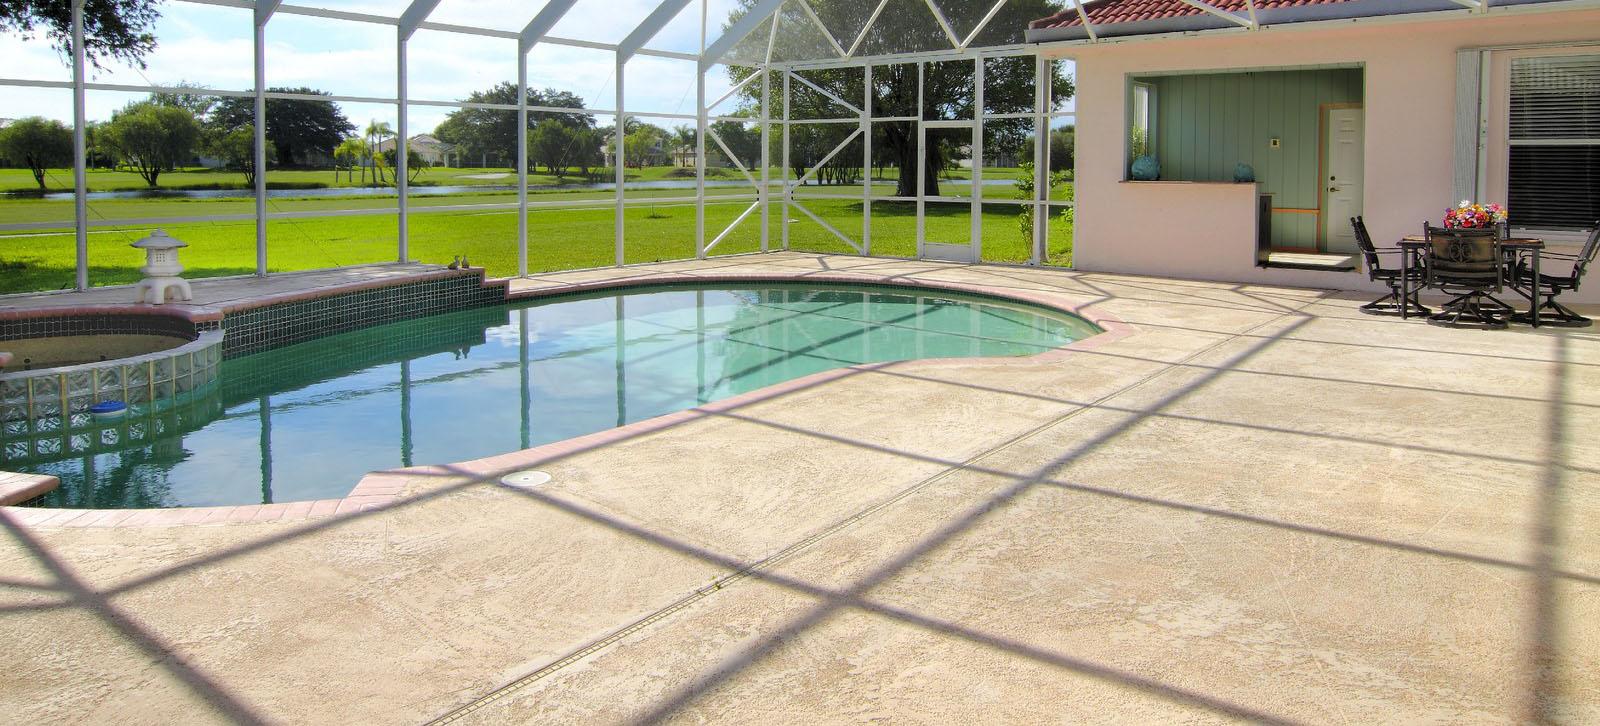 Pool Coping Paver